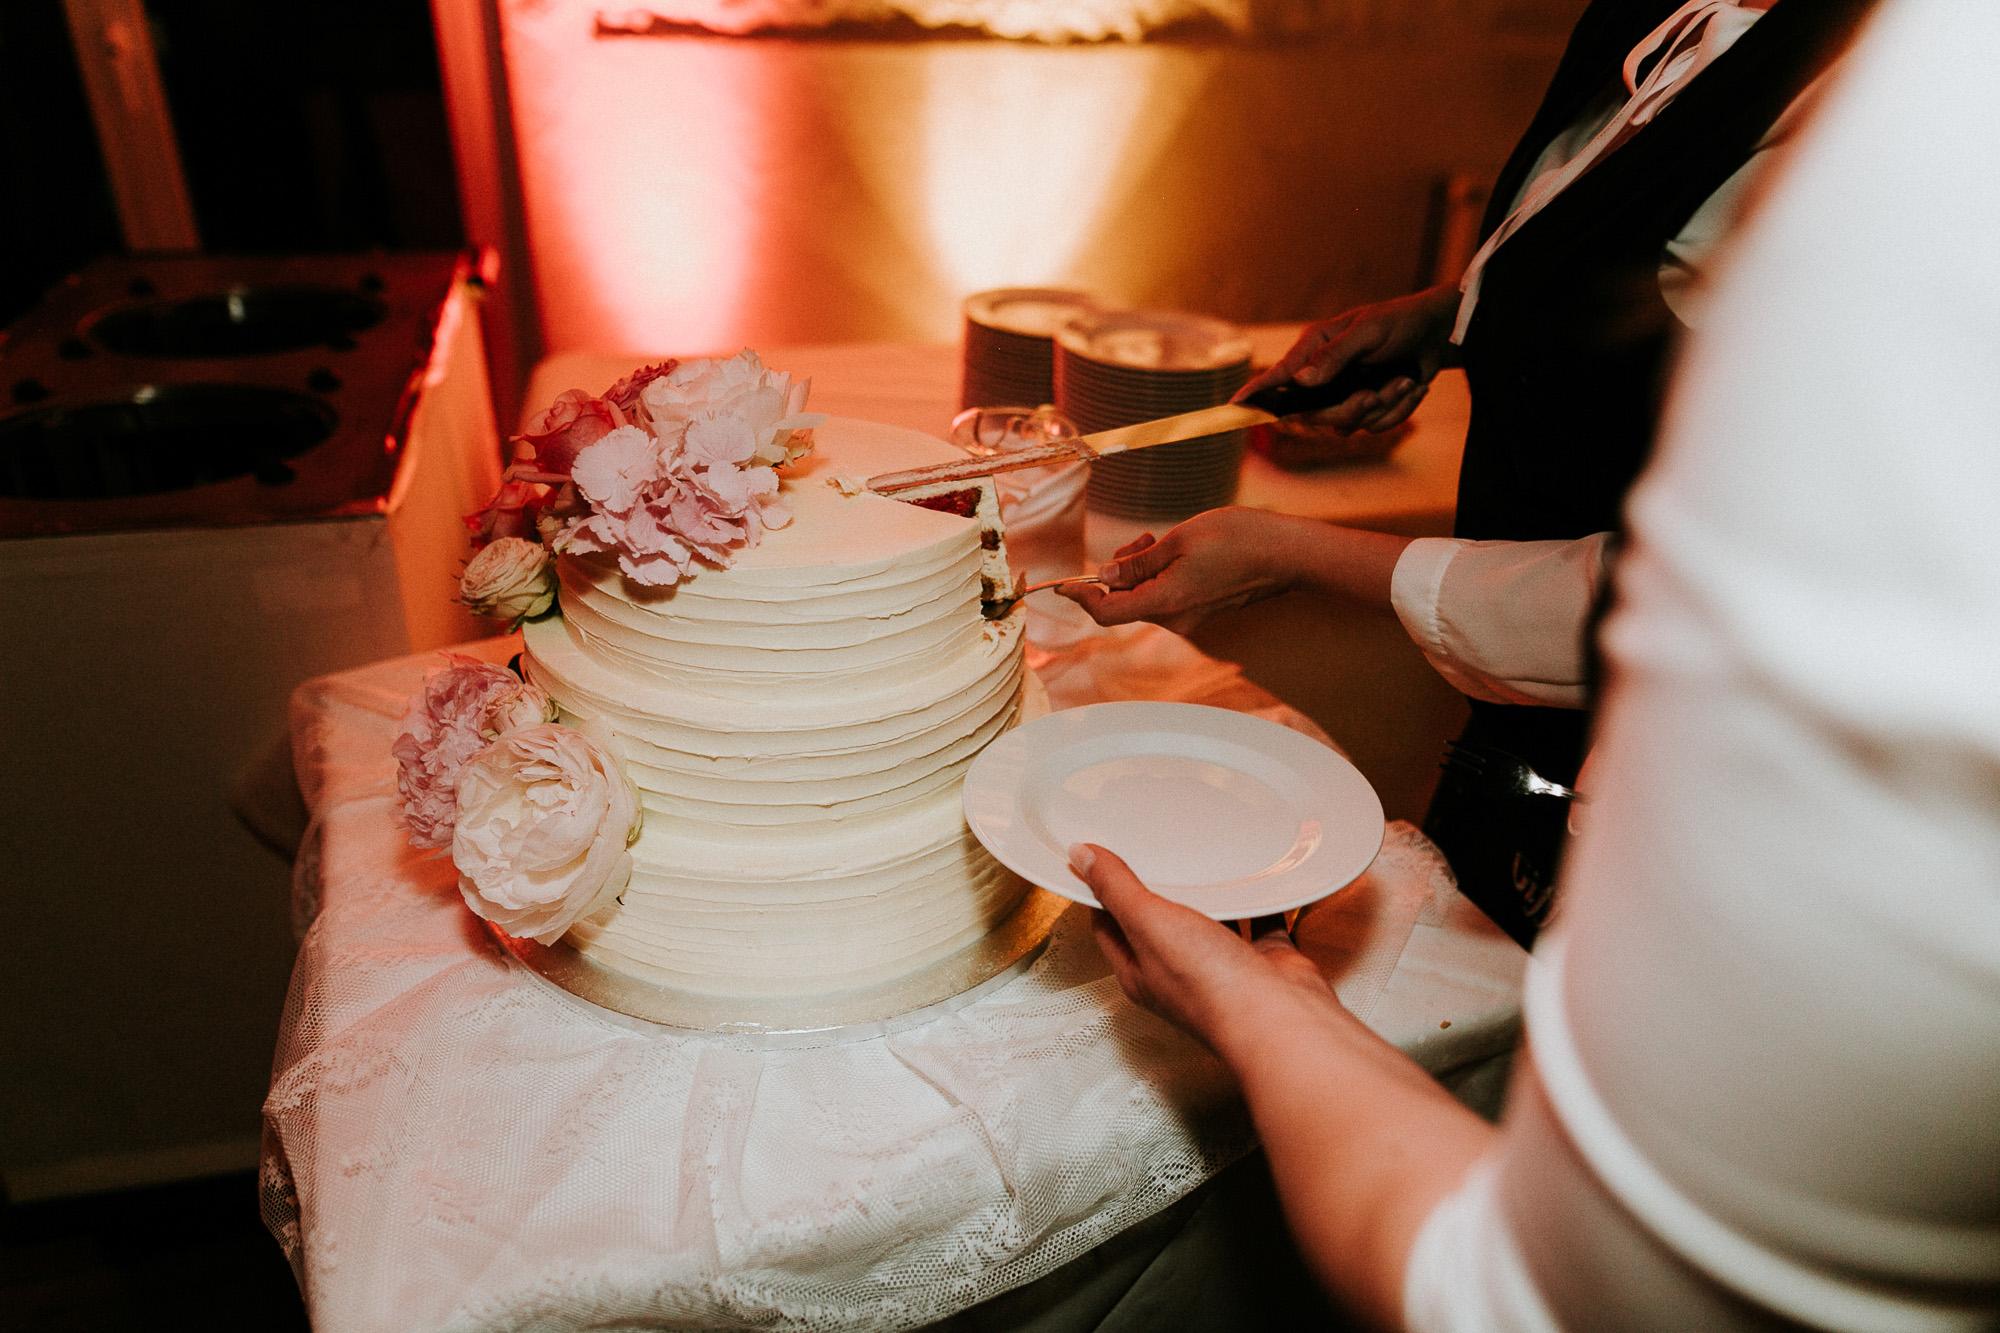 DanielaMarquardtPhotography_Hochzeitsfotograf_Düsseldorf_Köln_Mallorca_Bayern_Austria_Harz_Wedding_AileenundLennart_Weddingphotographer_Ibiza_Tuskany_Italien_Toskana_Portugal_Lissabon290